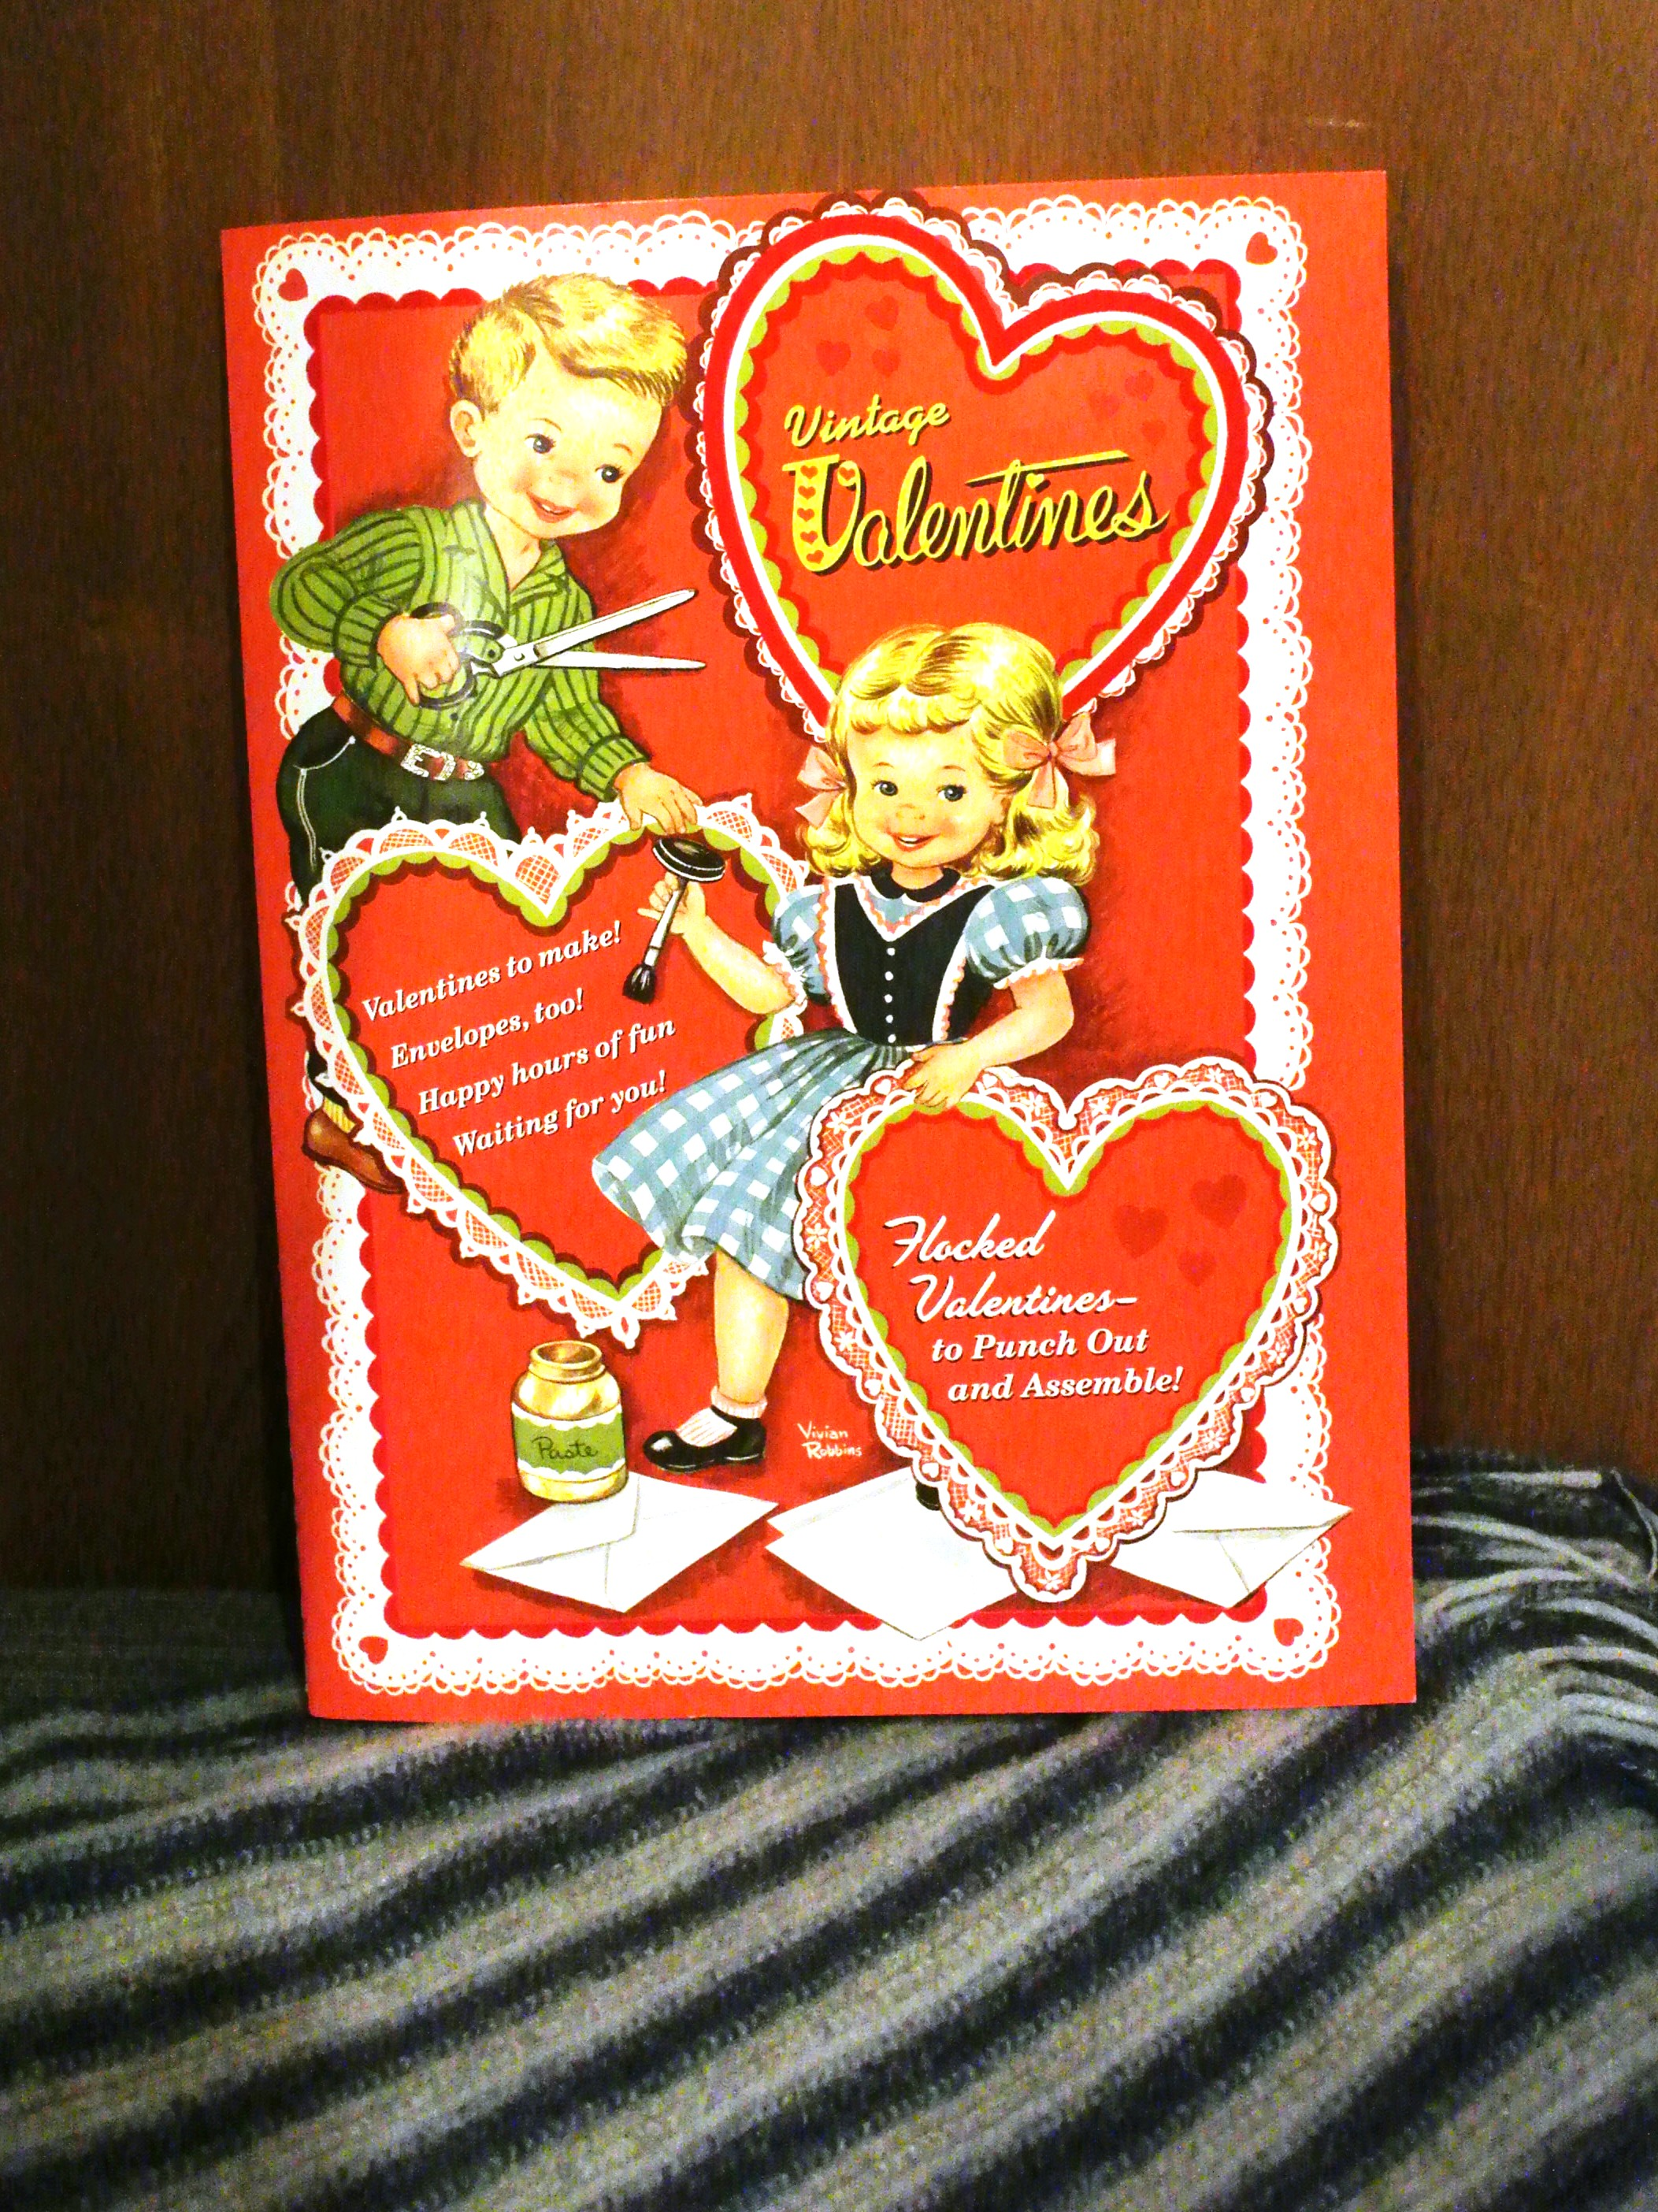 Valentines-y